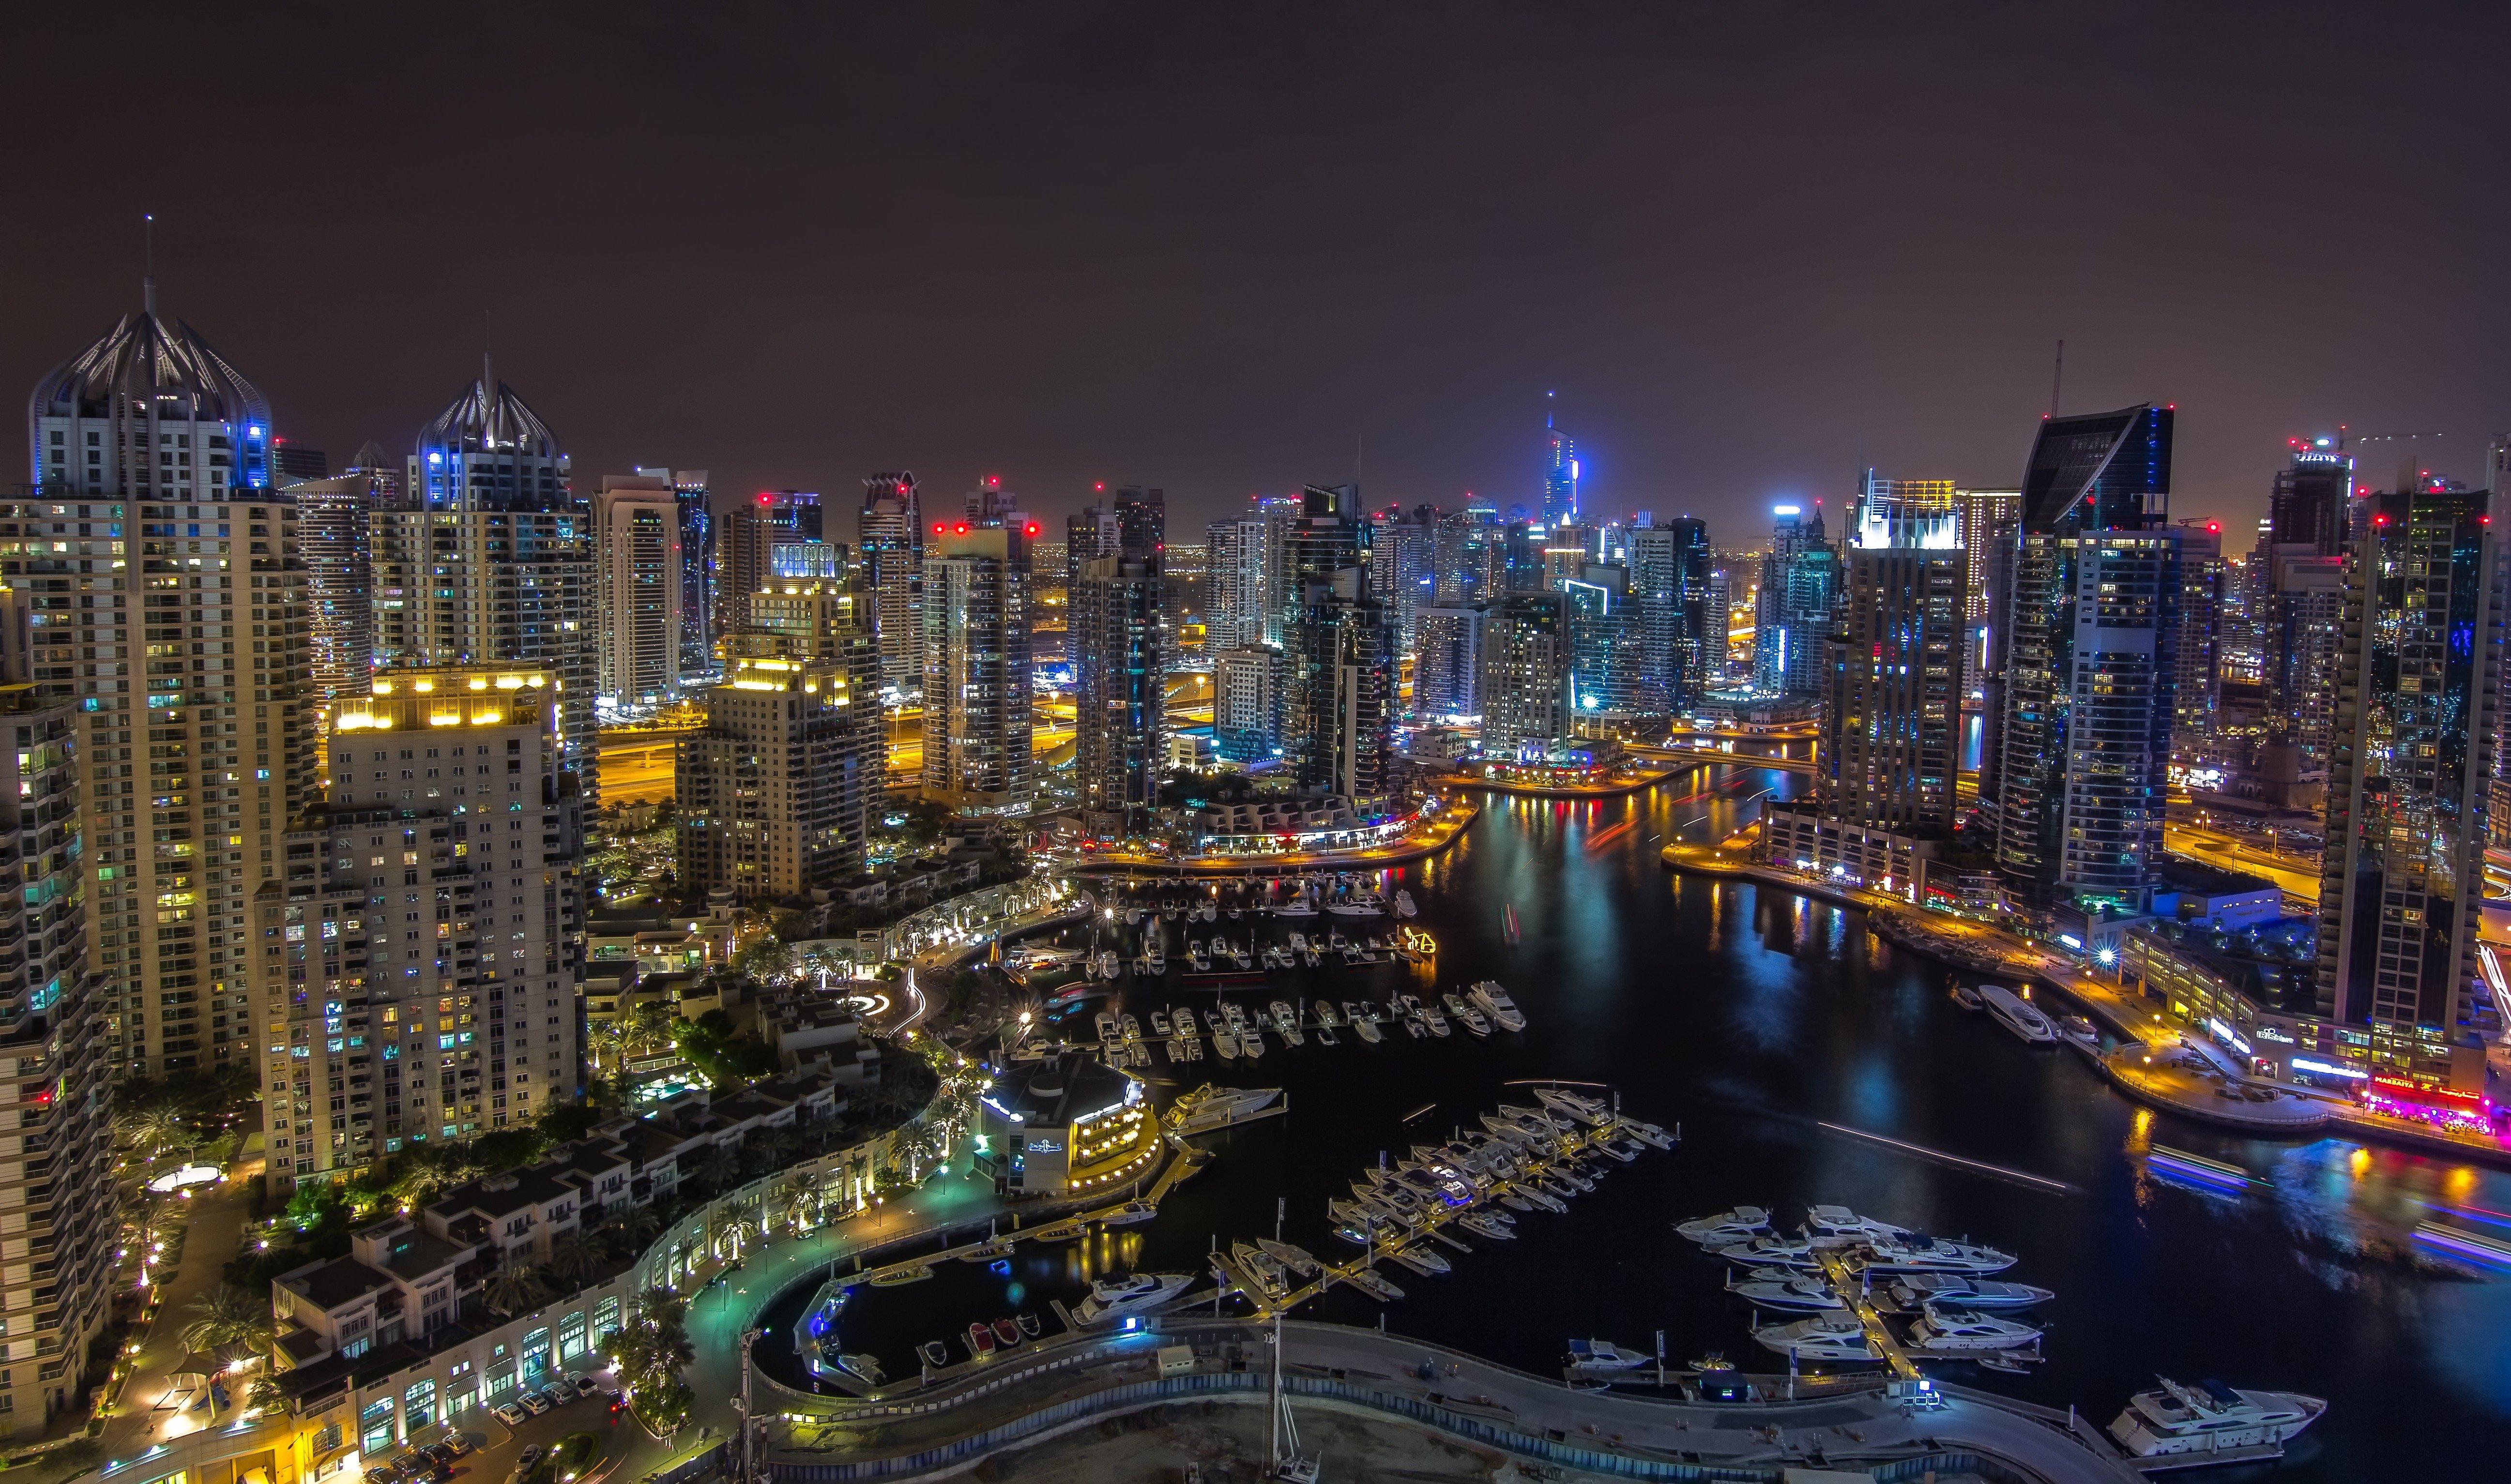 dubai uae night city panorama roads buildings skyscraper marina